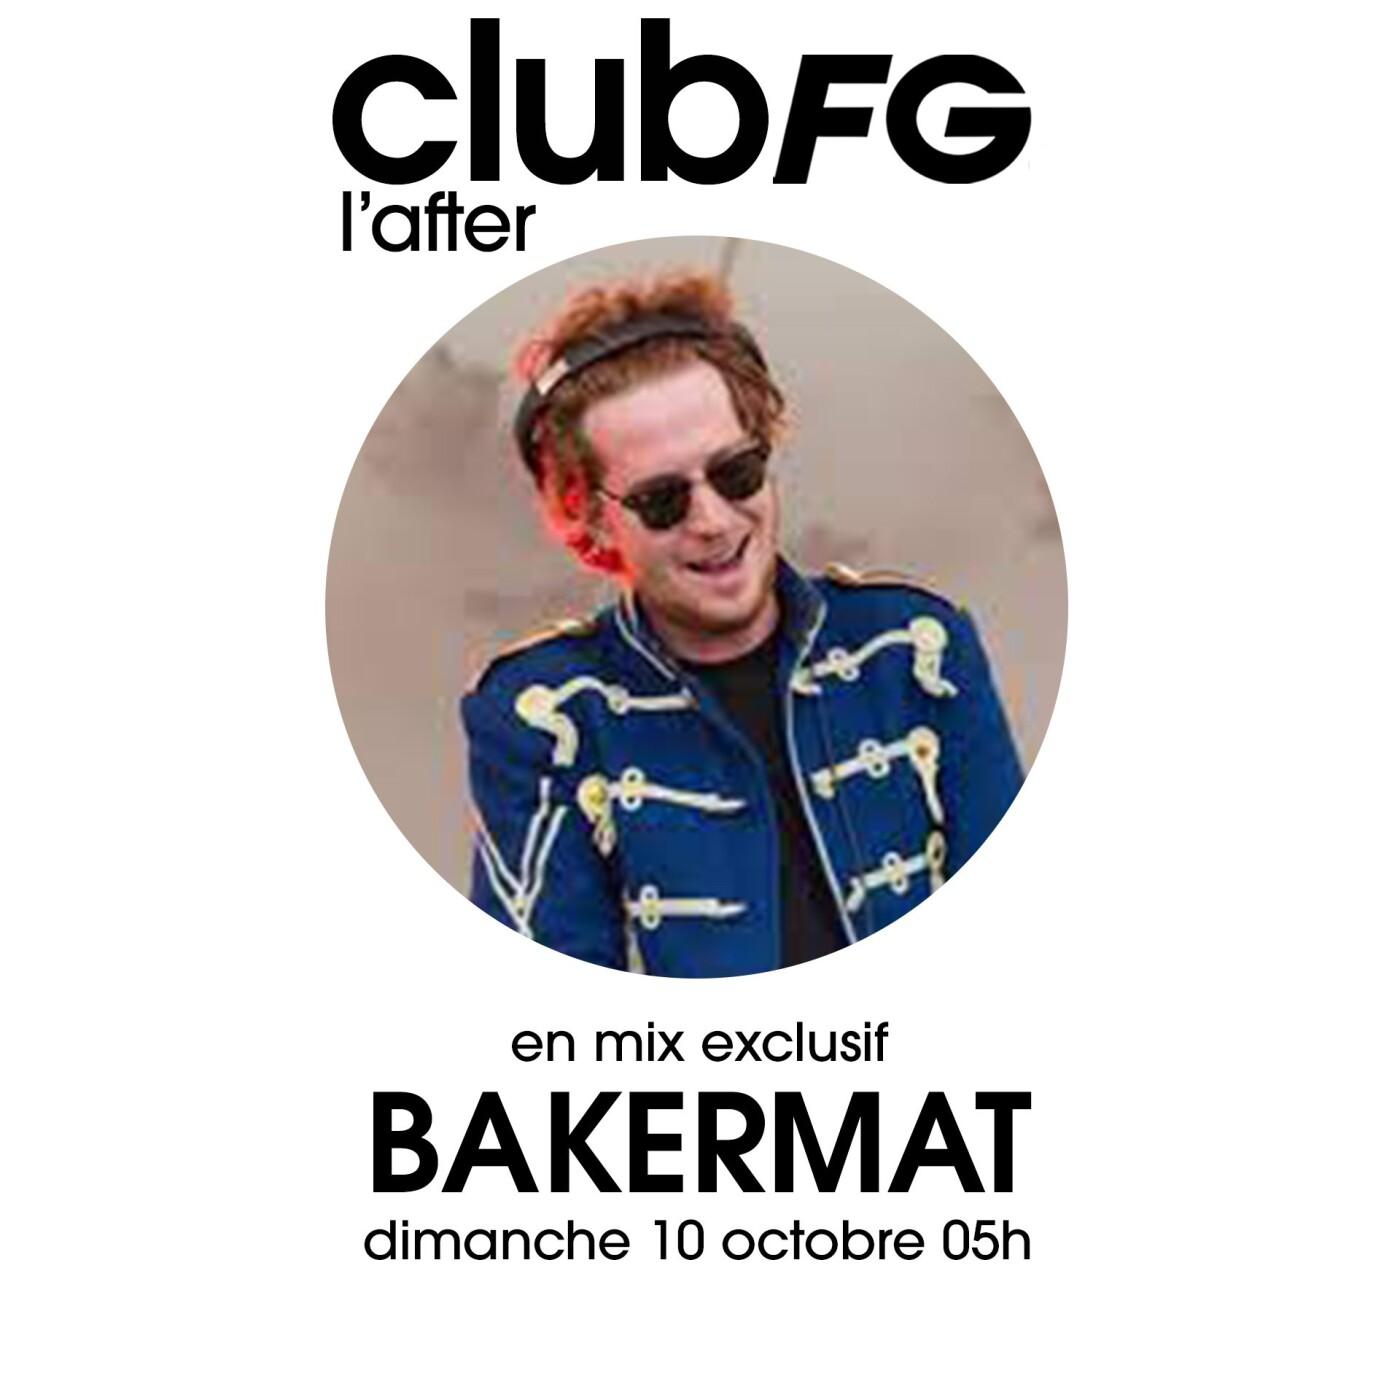 CLUB FG : BAKERMAT